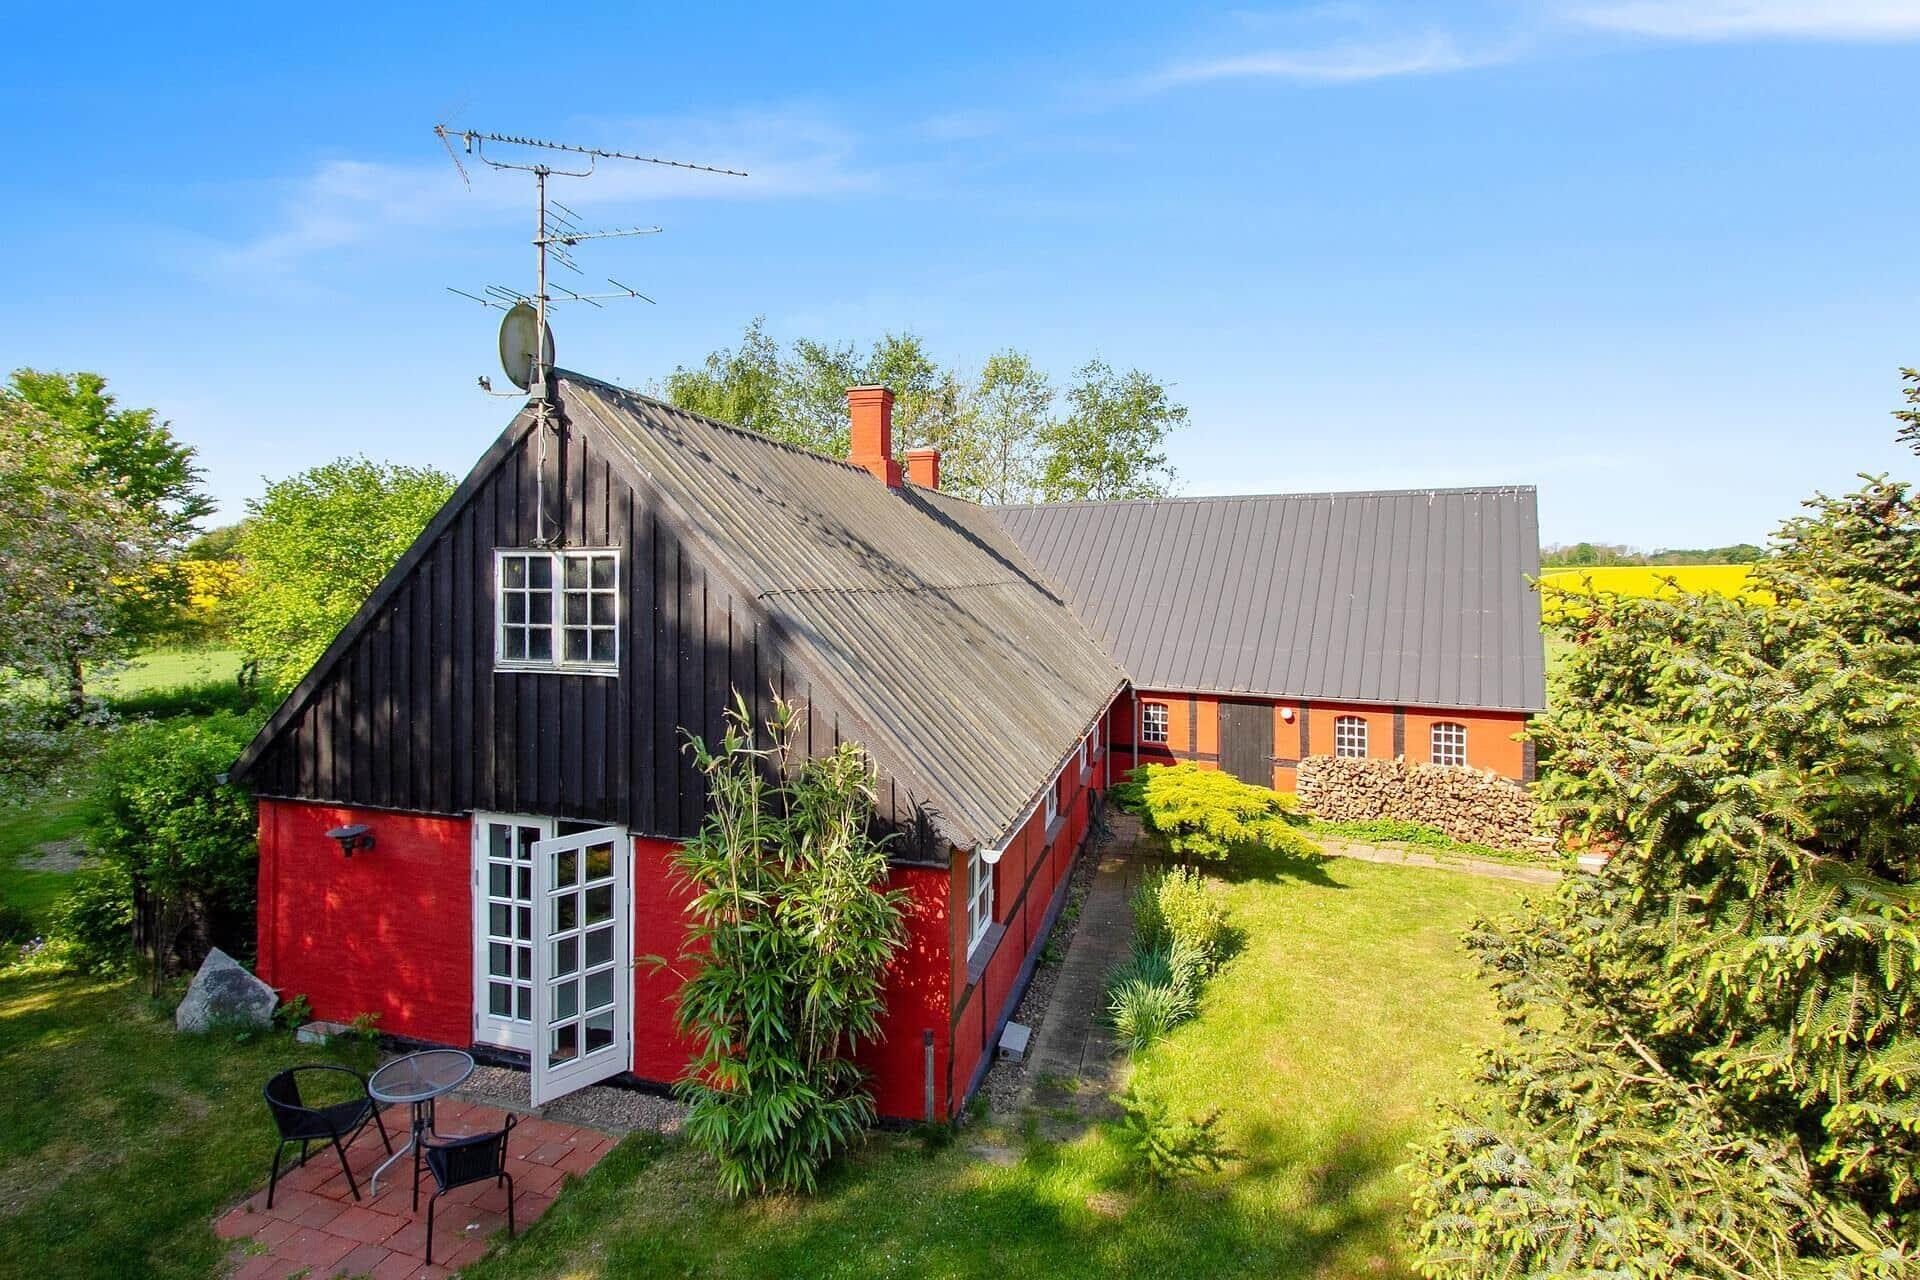 Image 1-10 Holiday-home 4748, Bodernevej 12, DK - 3720 Aakirkeby